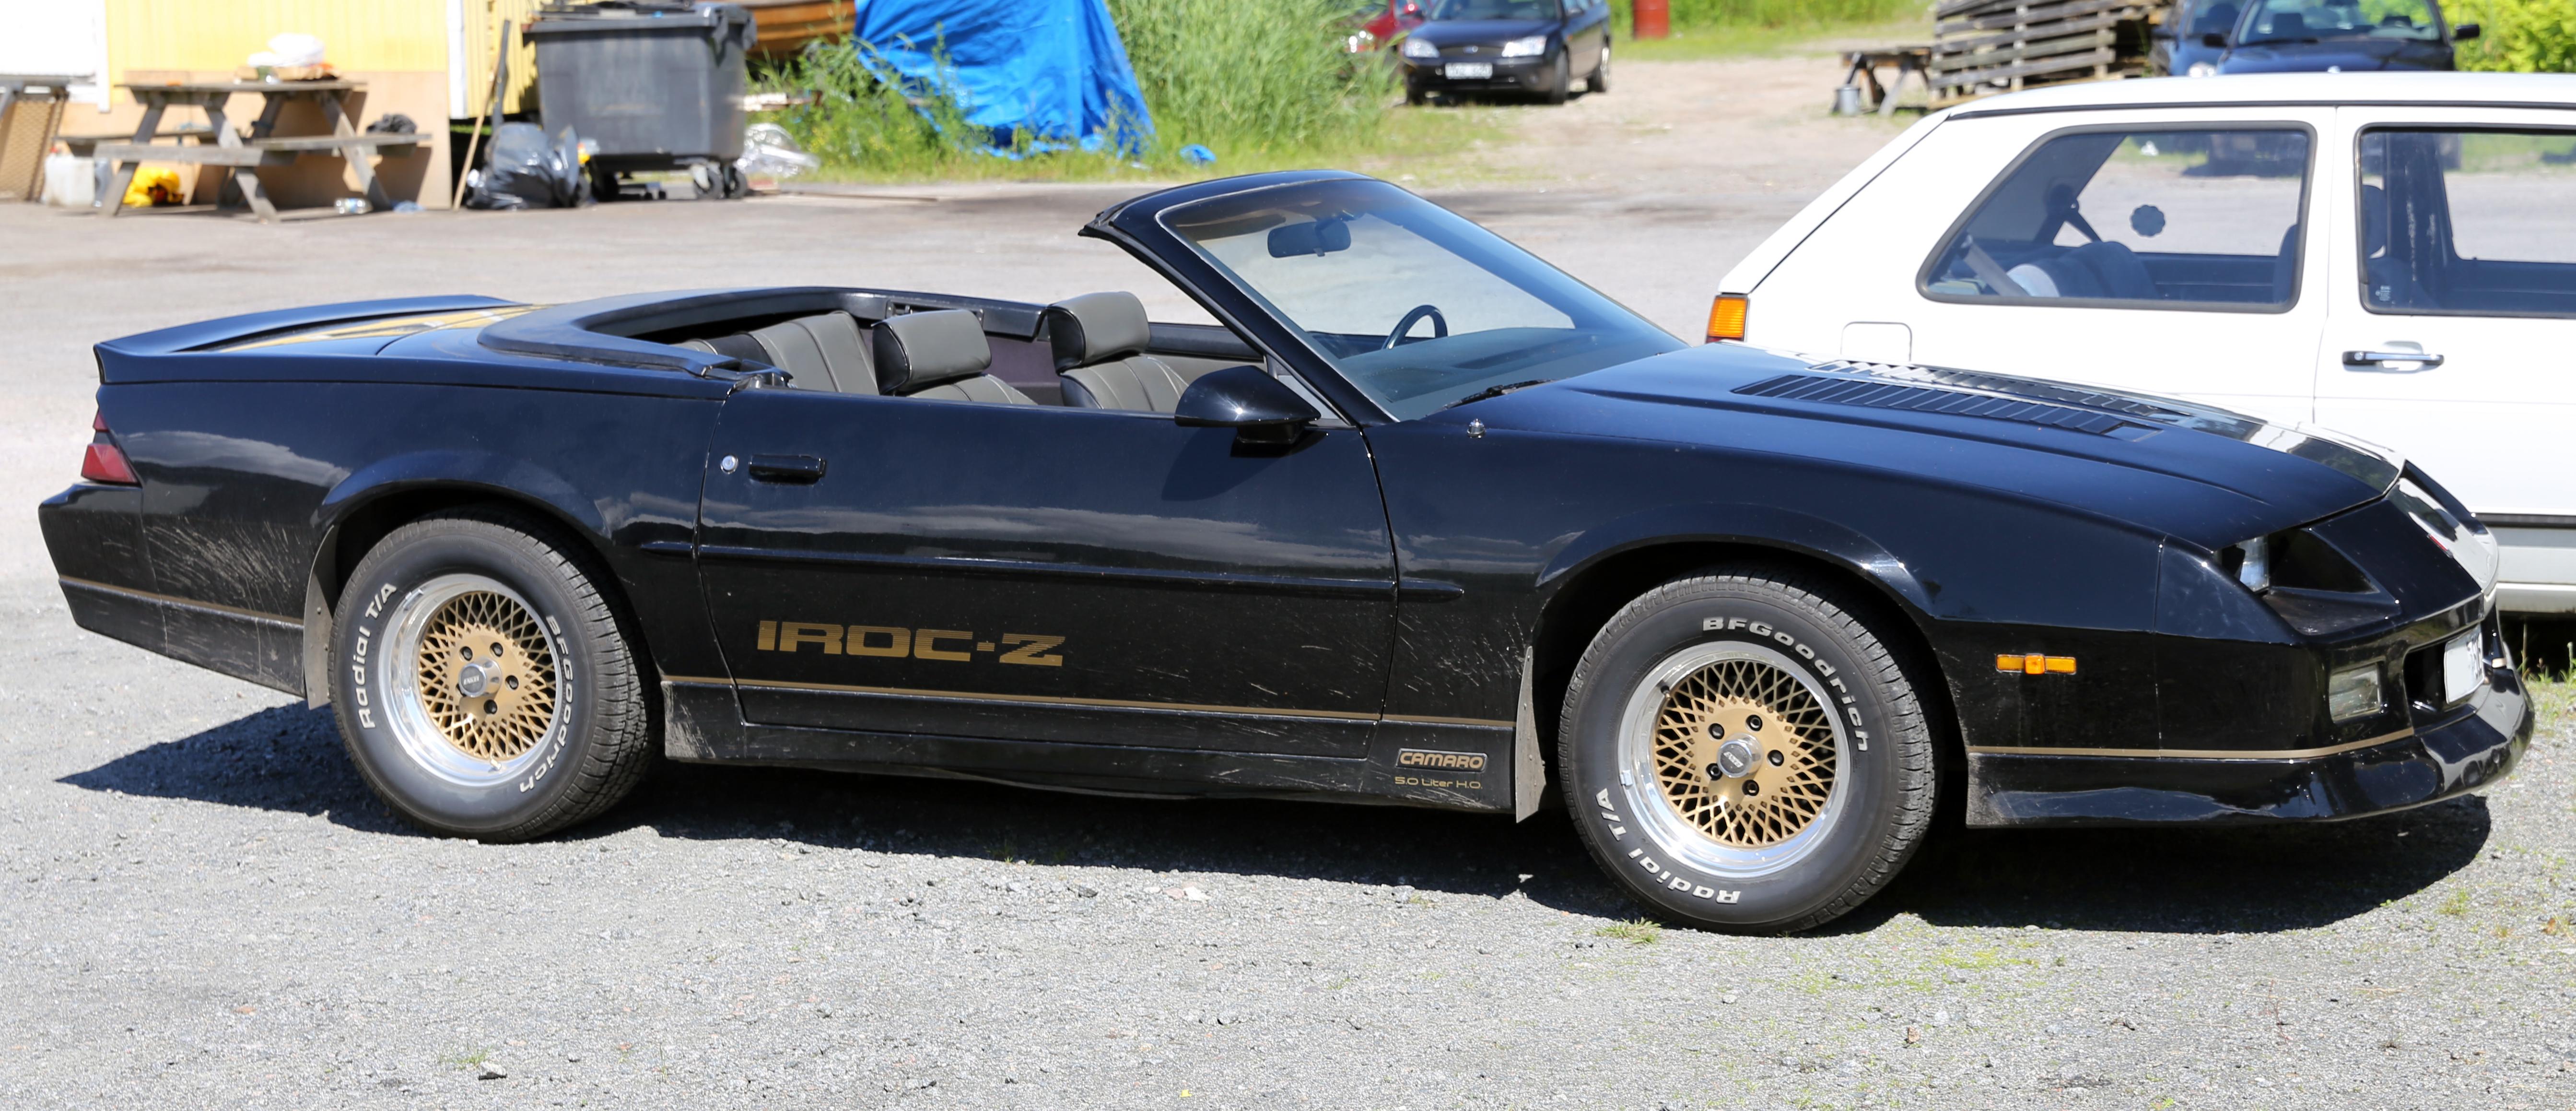 Iroc Z Wiki >> File:1988 Chevrolet Camaro IROC-Z convertible.jpg - Wikimedia Commons